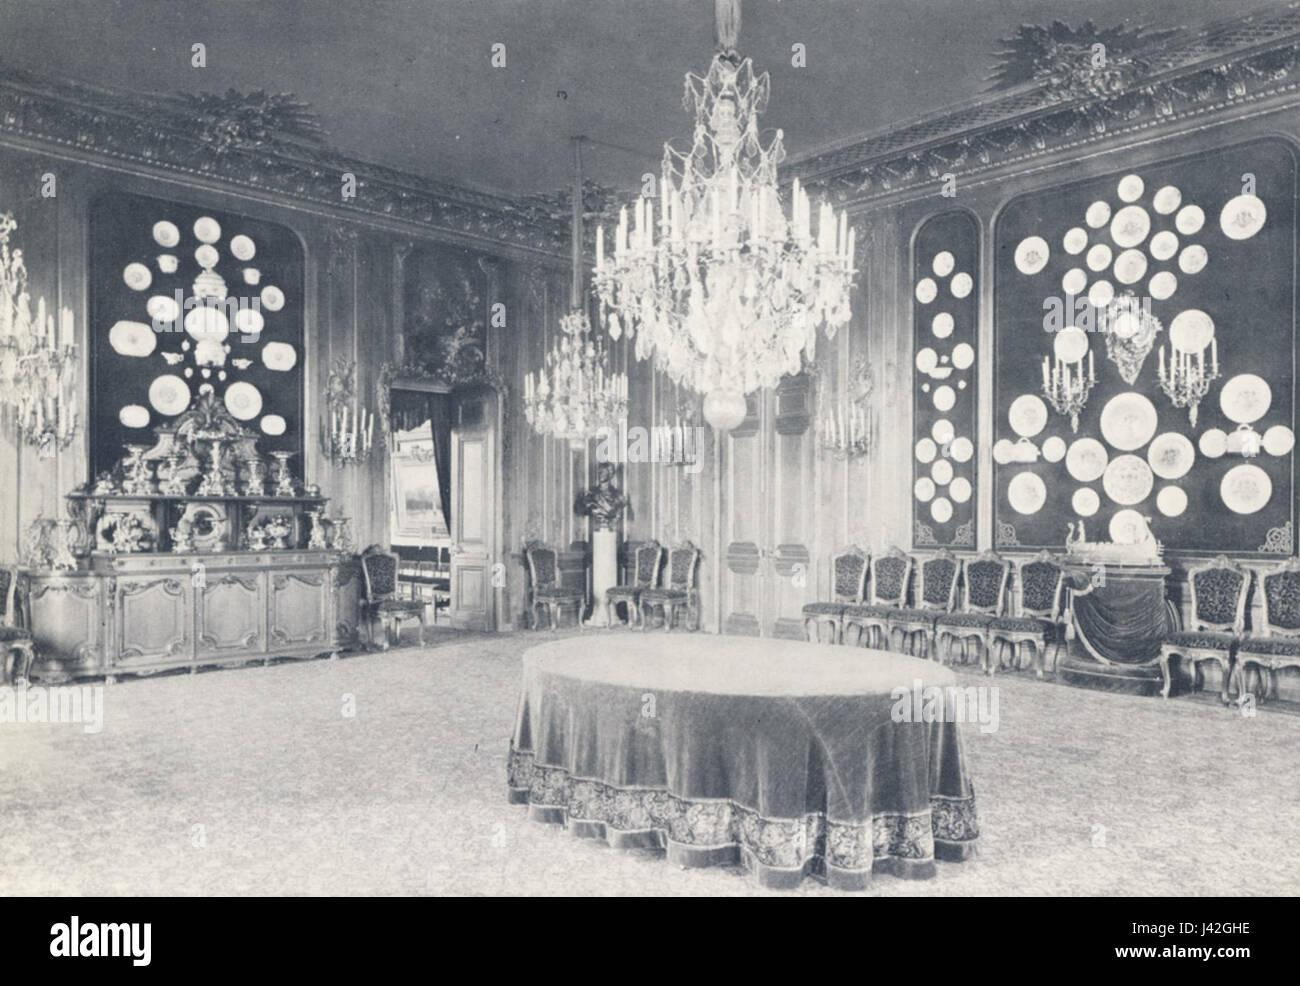 Lovisa Ulrikas matsal 1887 - Stock Image